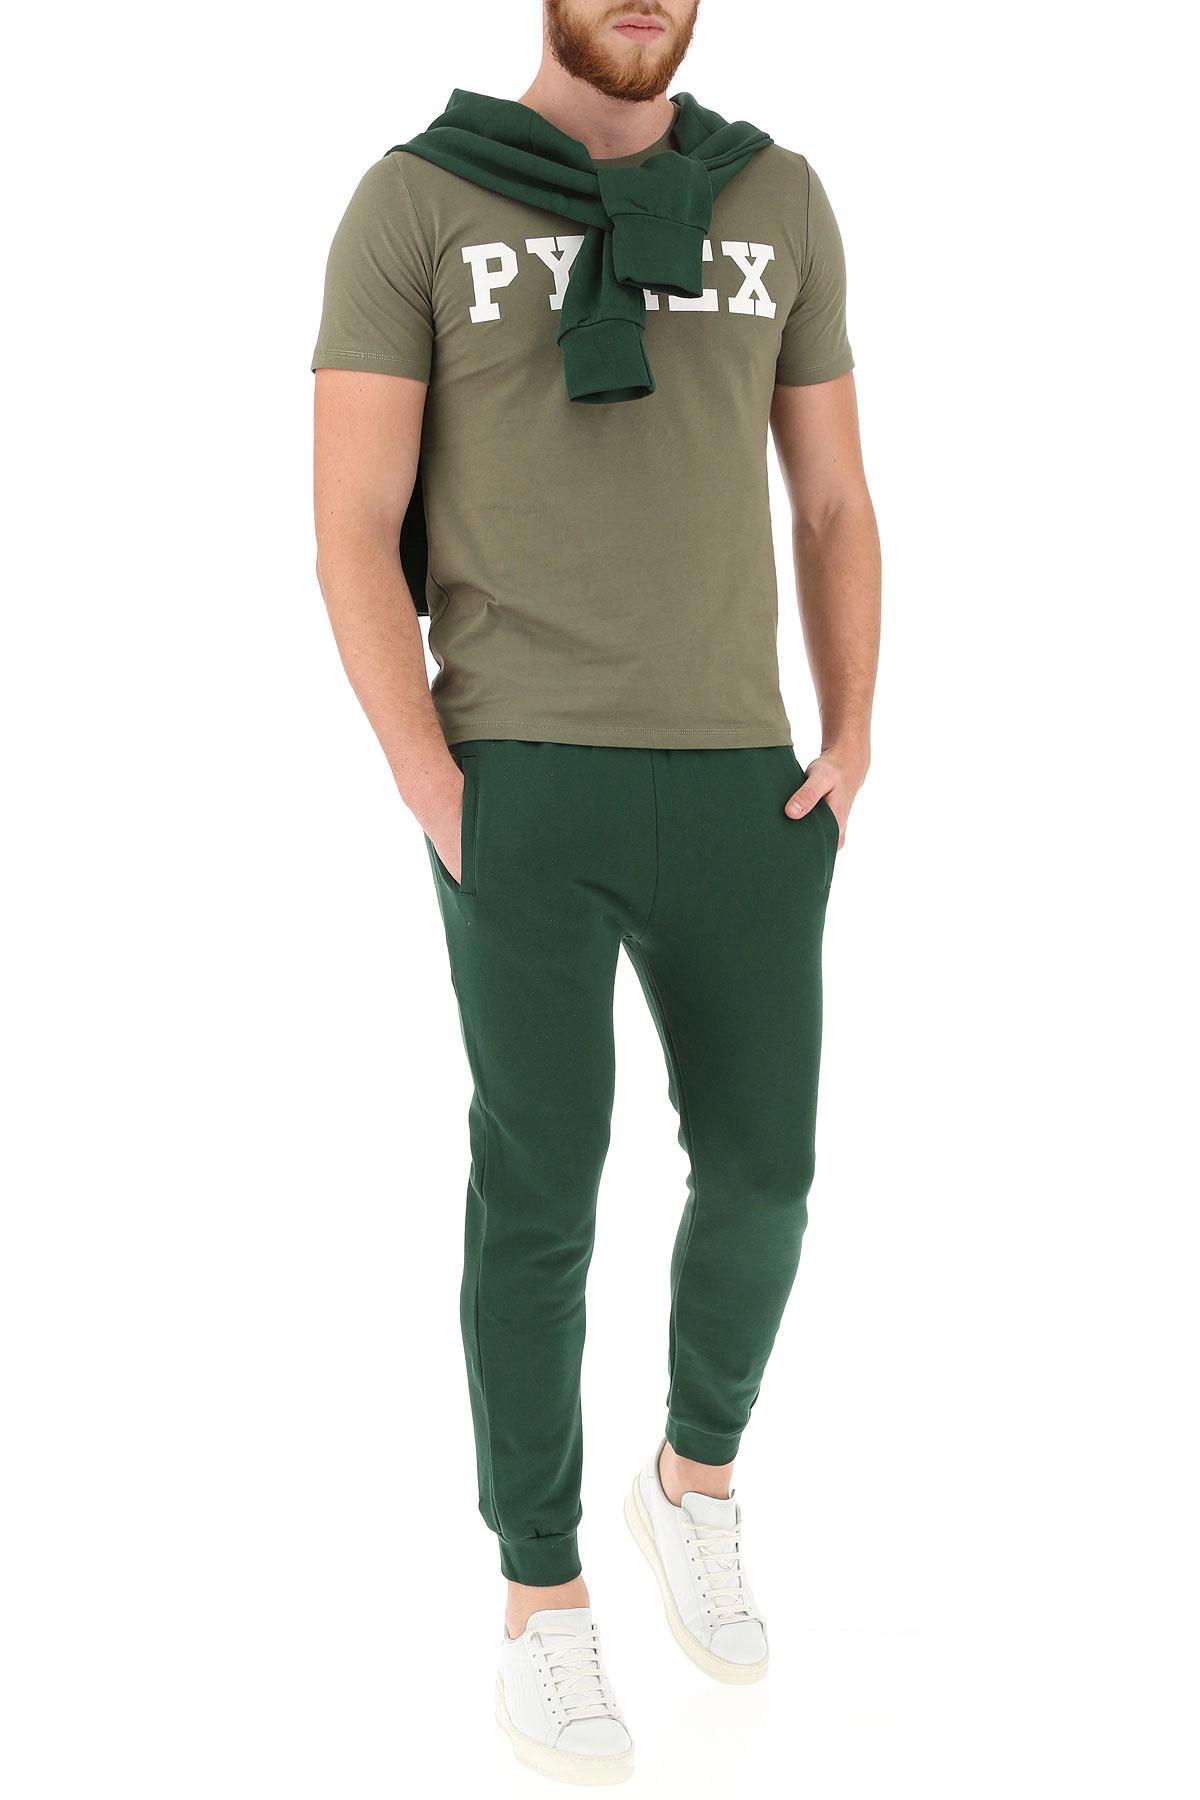 Para Verde Pyrex Militar Hombres Ropa 19 invierno 2018 Otoño nbsp; 65xSvxw0q